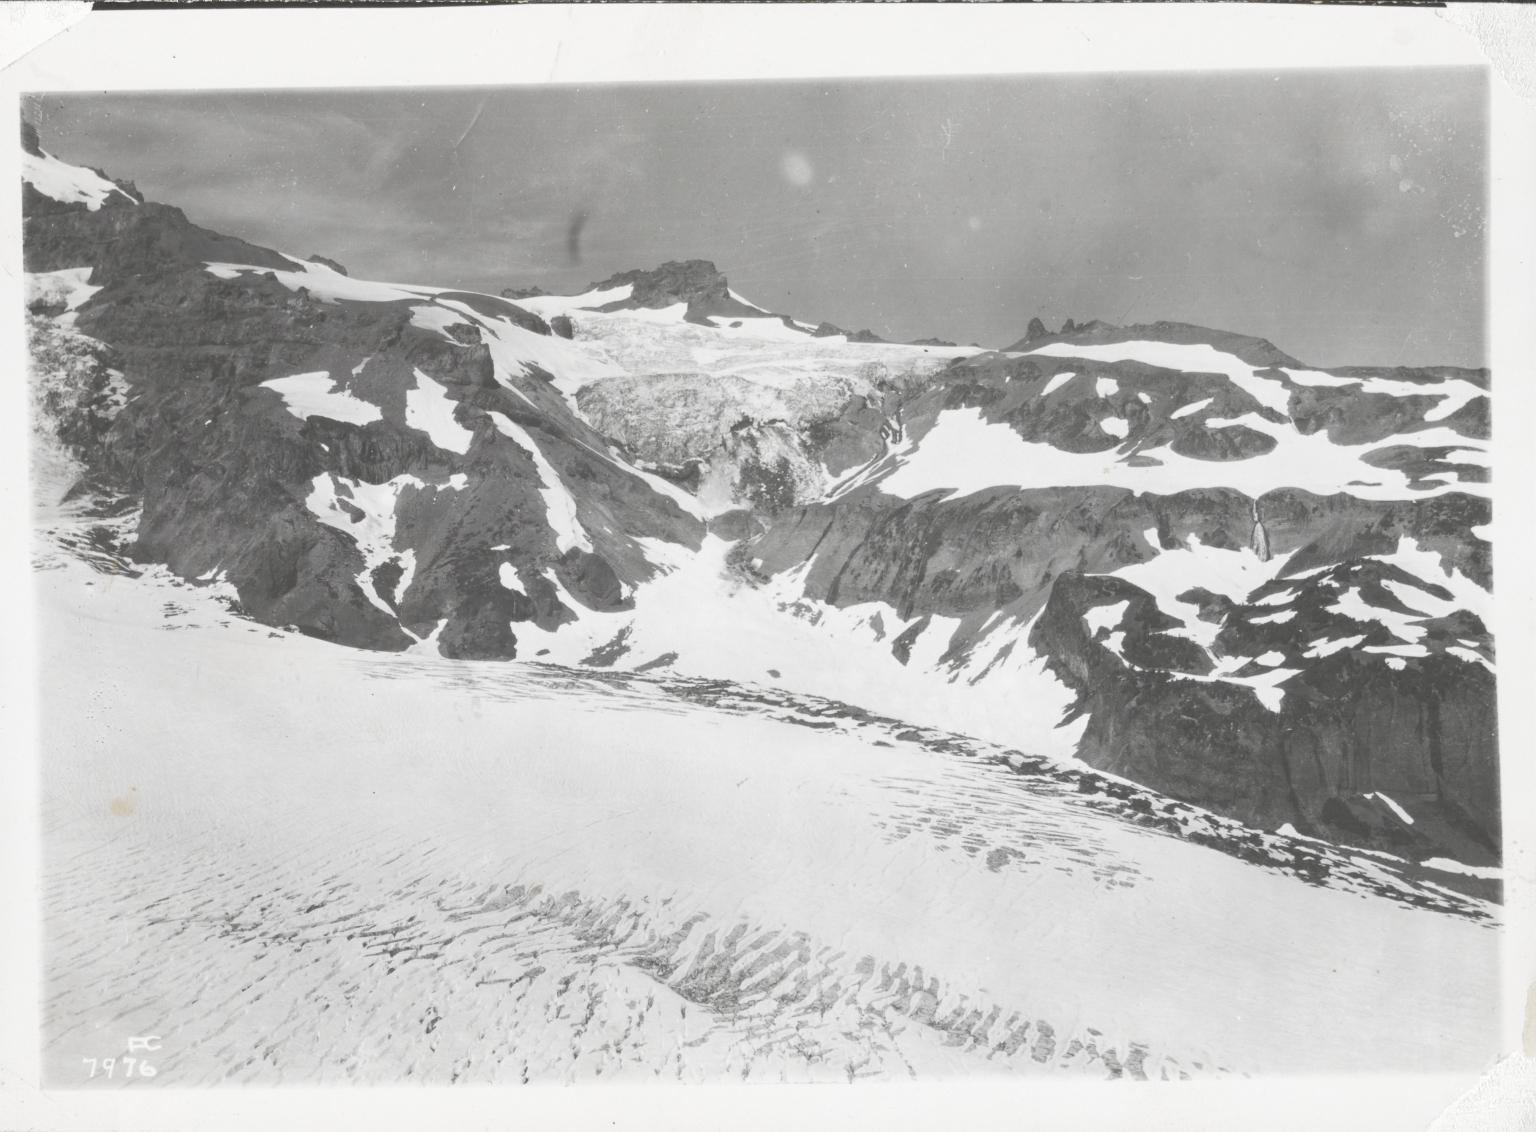 Whitman Glacier, Washington